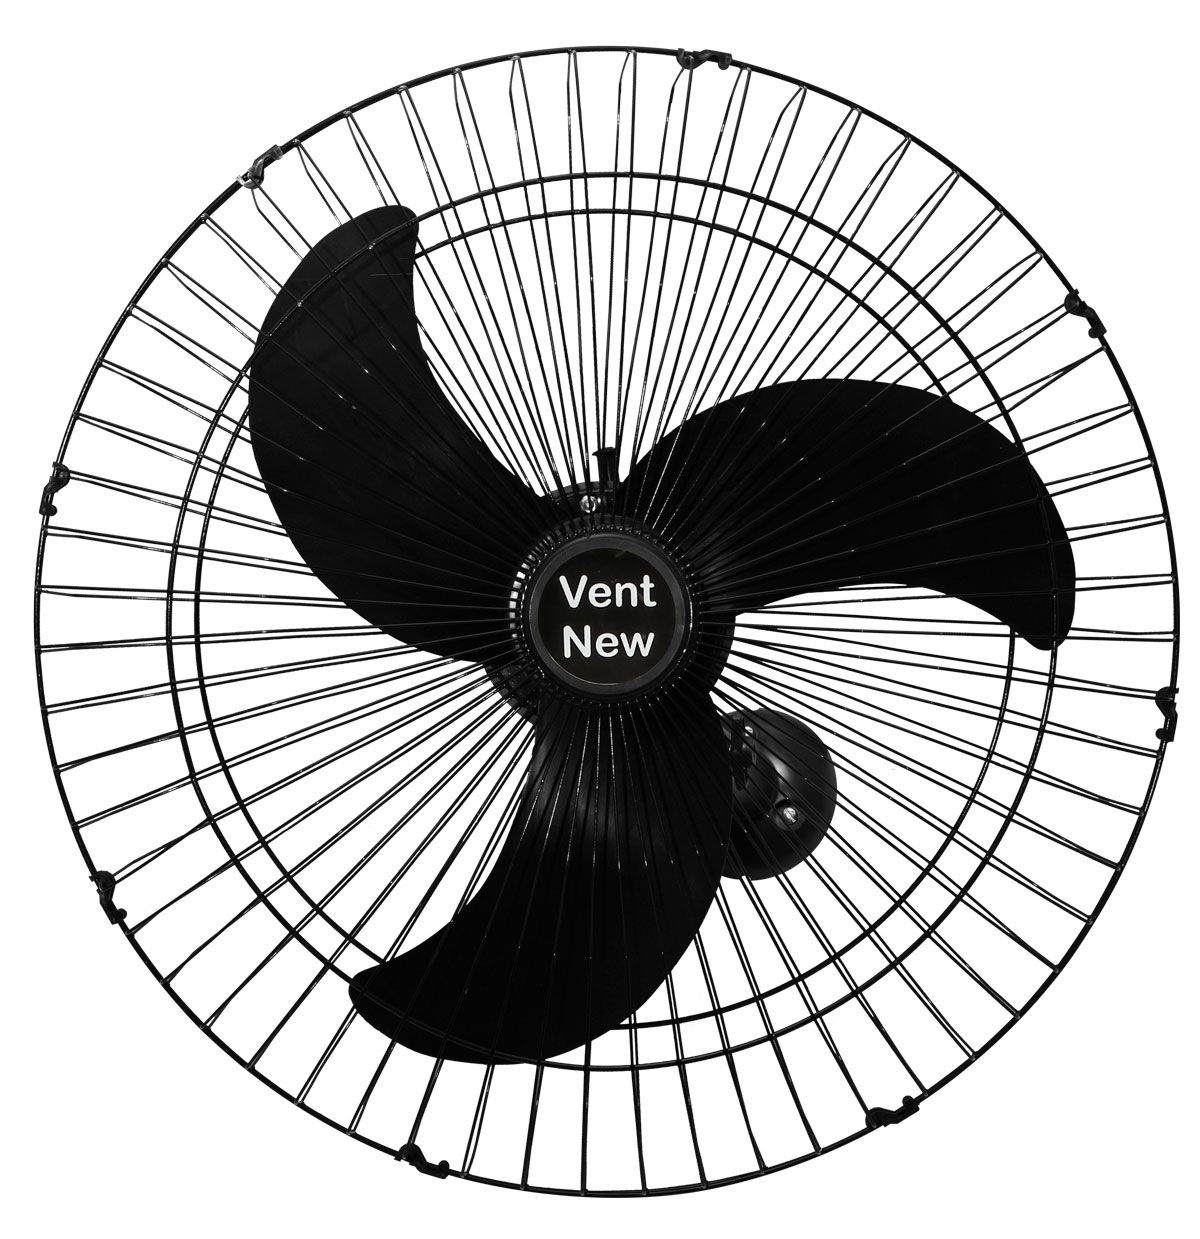 Kit 3 Ventiladores Parede Bivolt Preto Oscilante 60 Cm